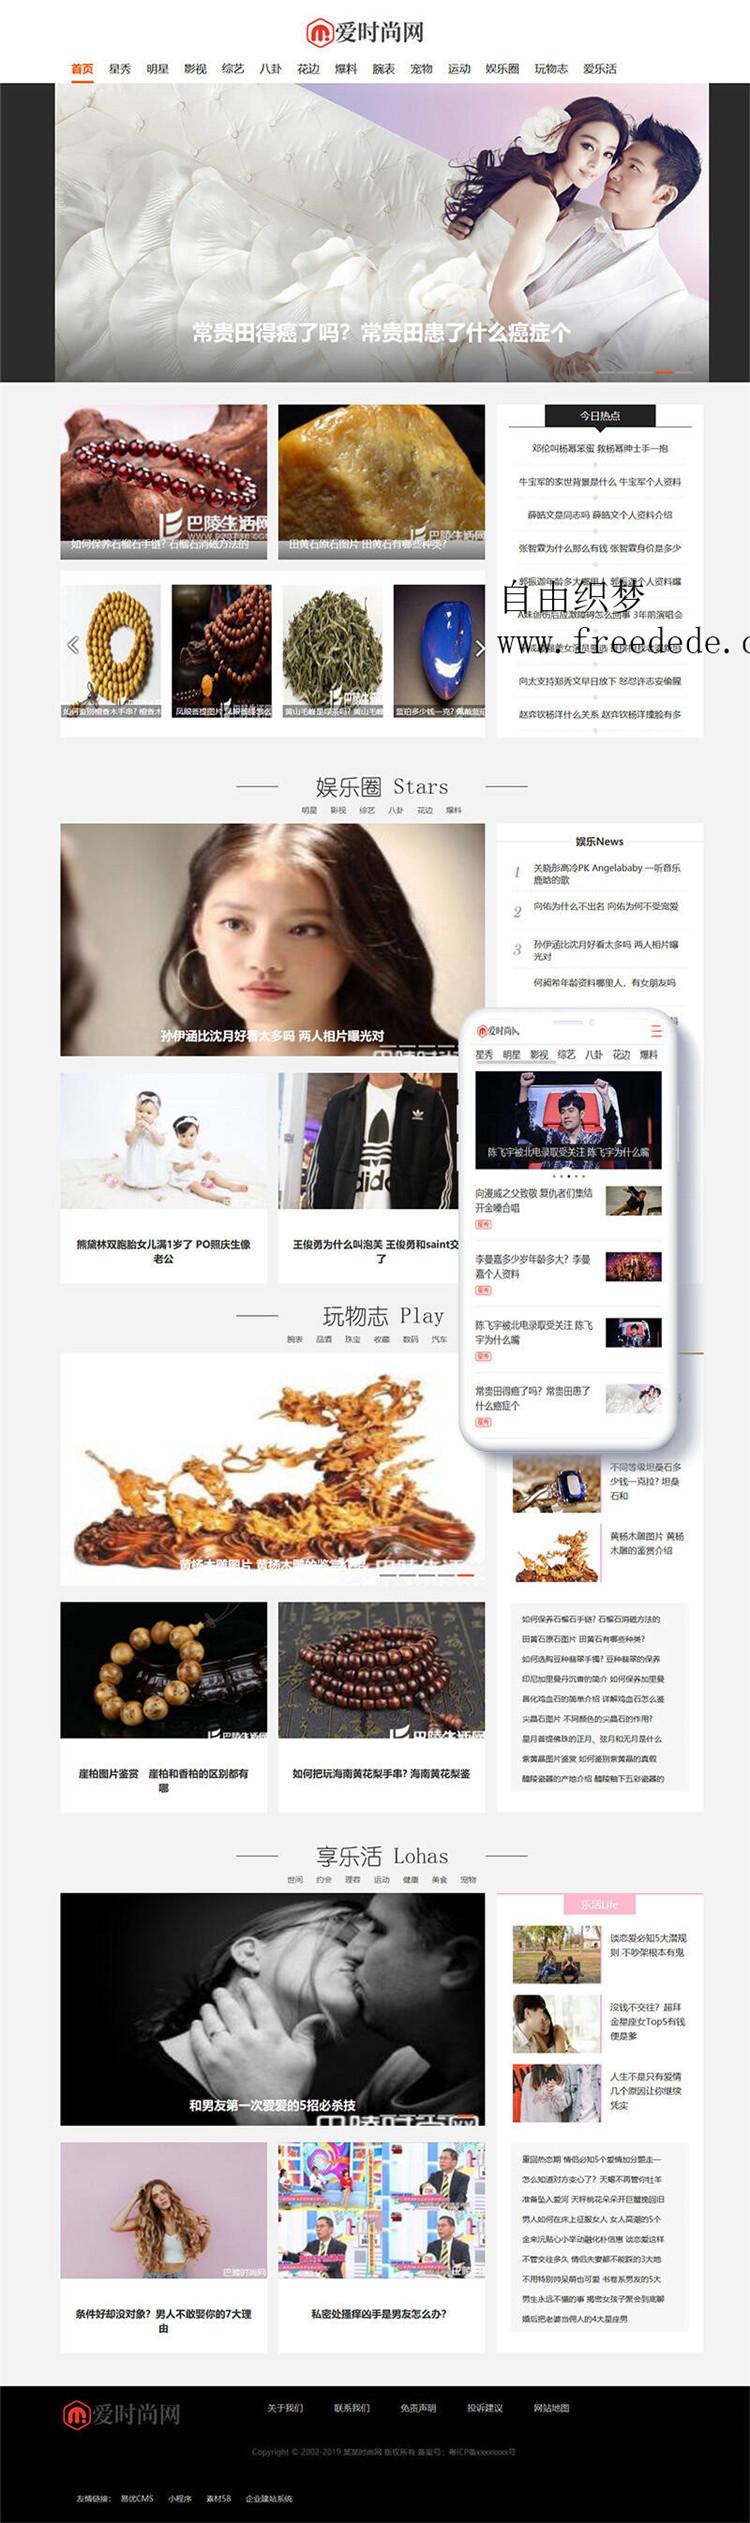 dedecms模板下载 时尚新闻资讯类网站织梦模板(带手机端)